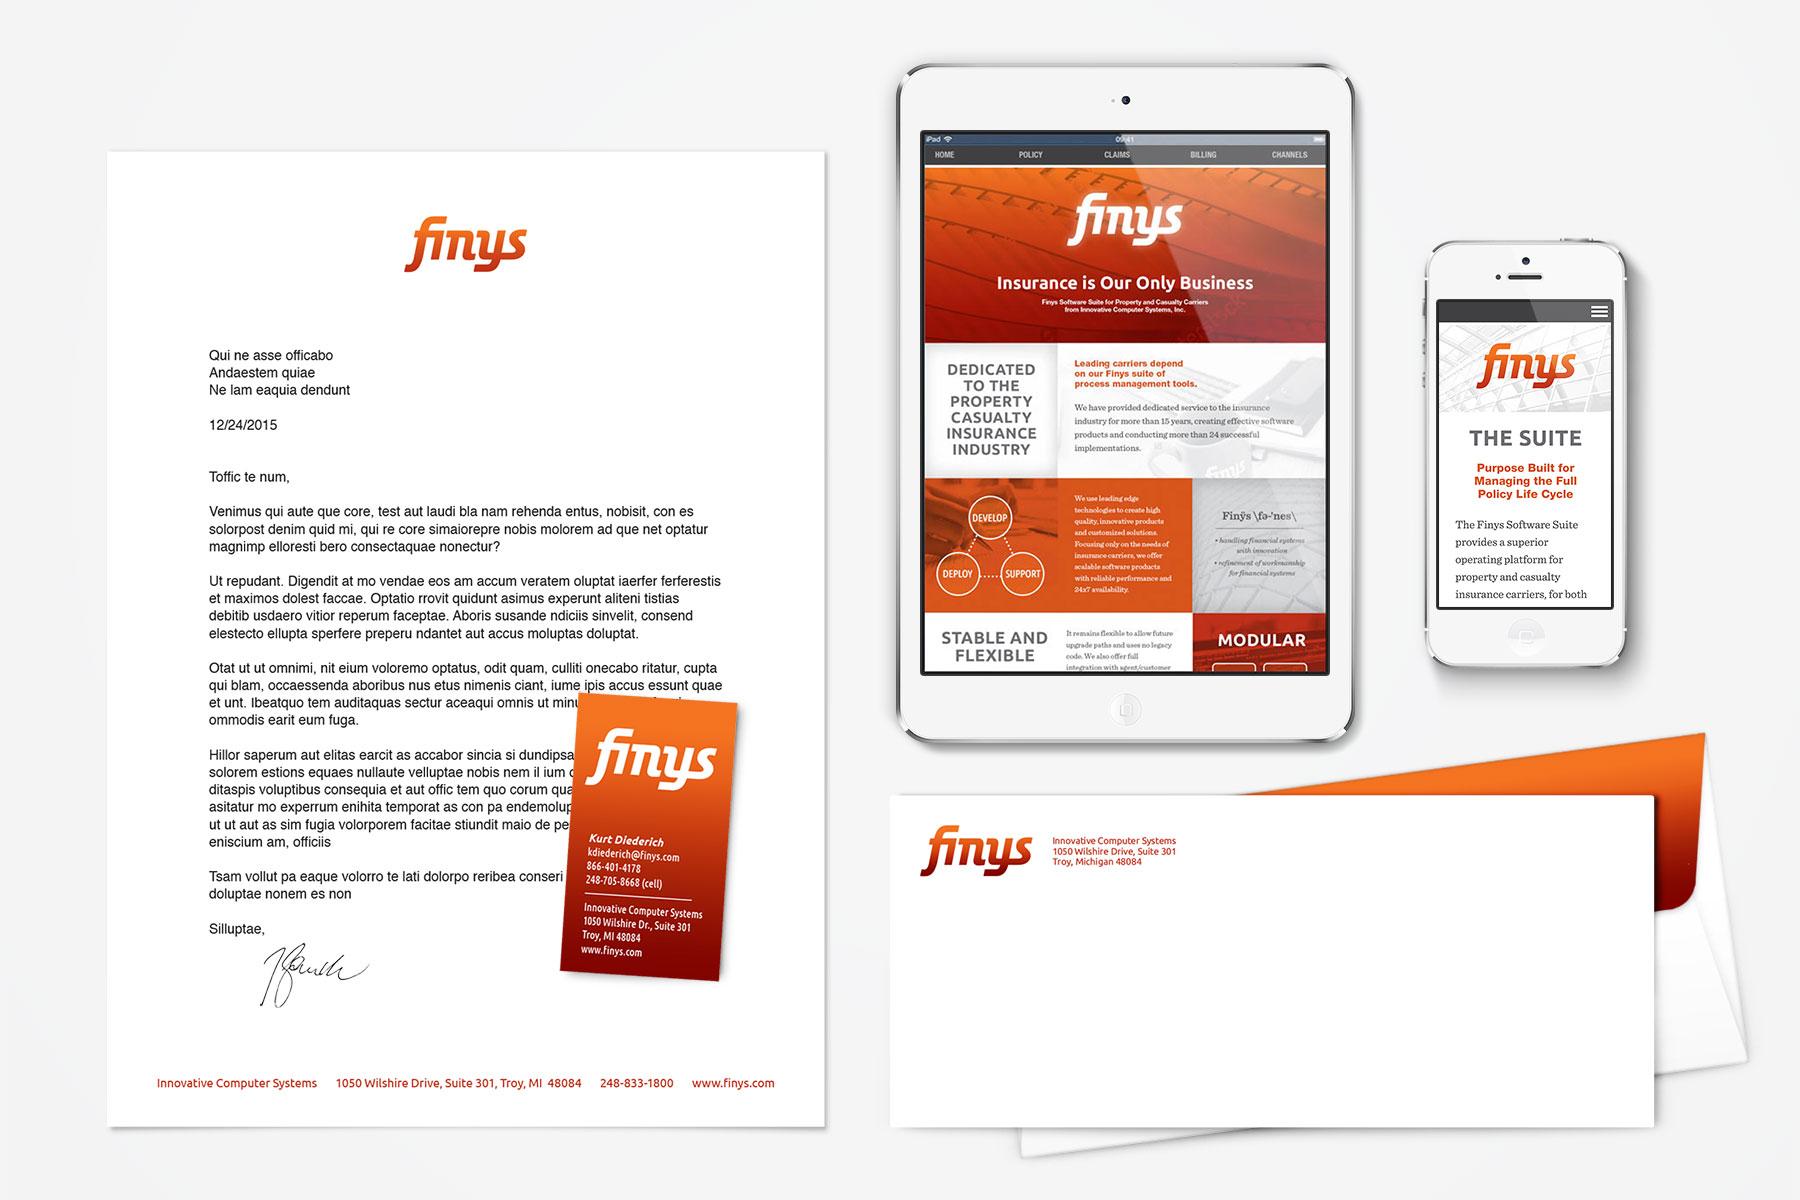 Finys_BrandingIDMock-Up_white.jpg